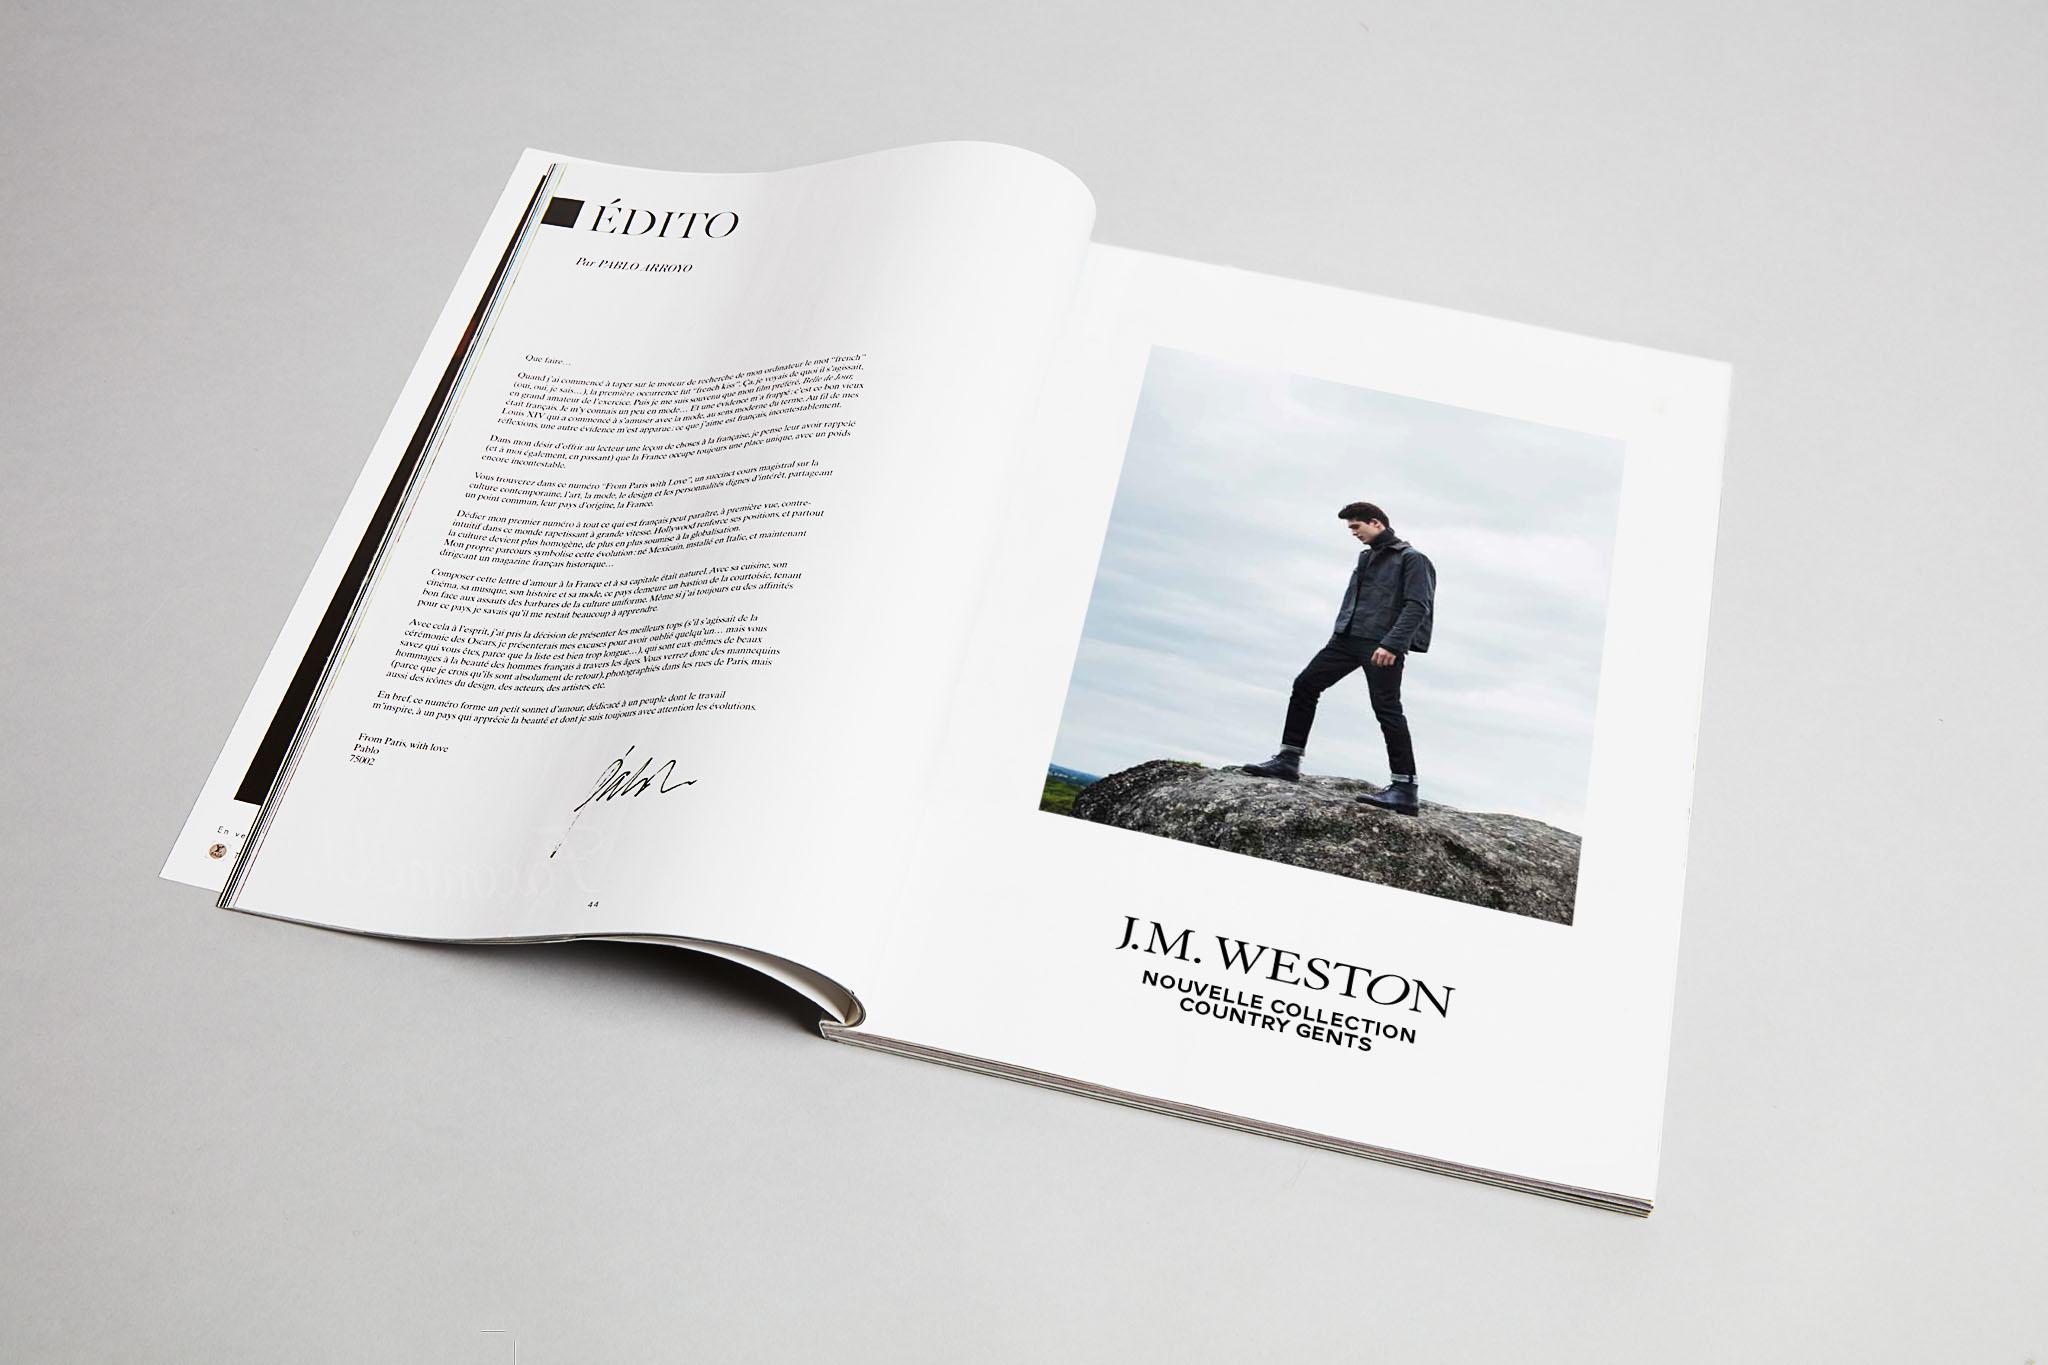 J.M. WESTON Country Gents. Mocassin Manufacture française Made in France Soulier Luxe Campagne Publicité